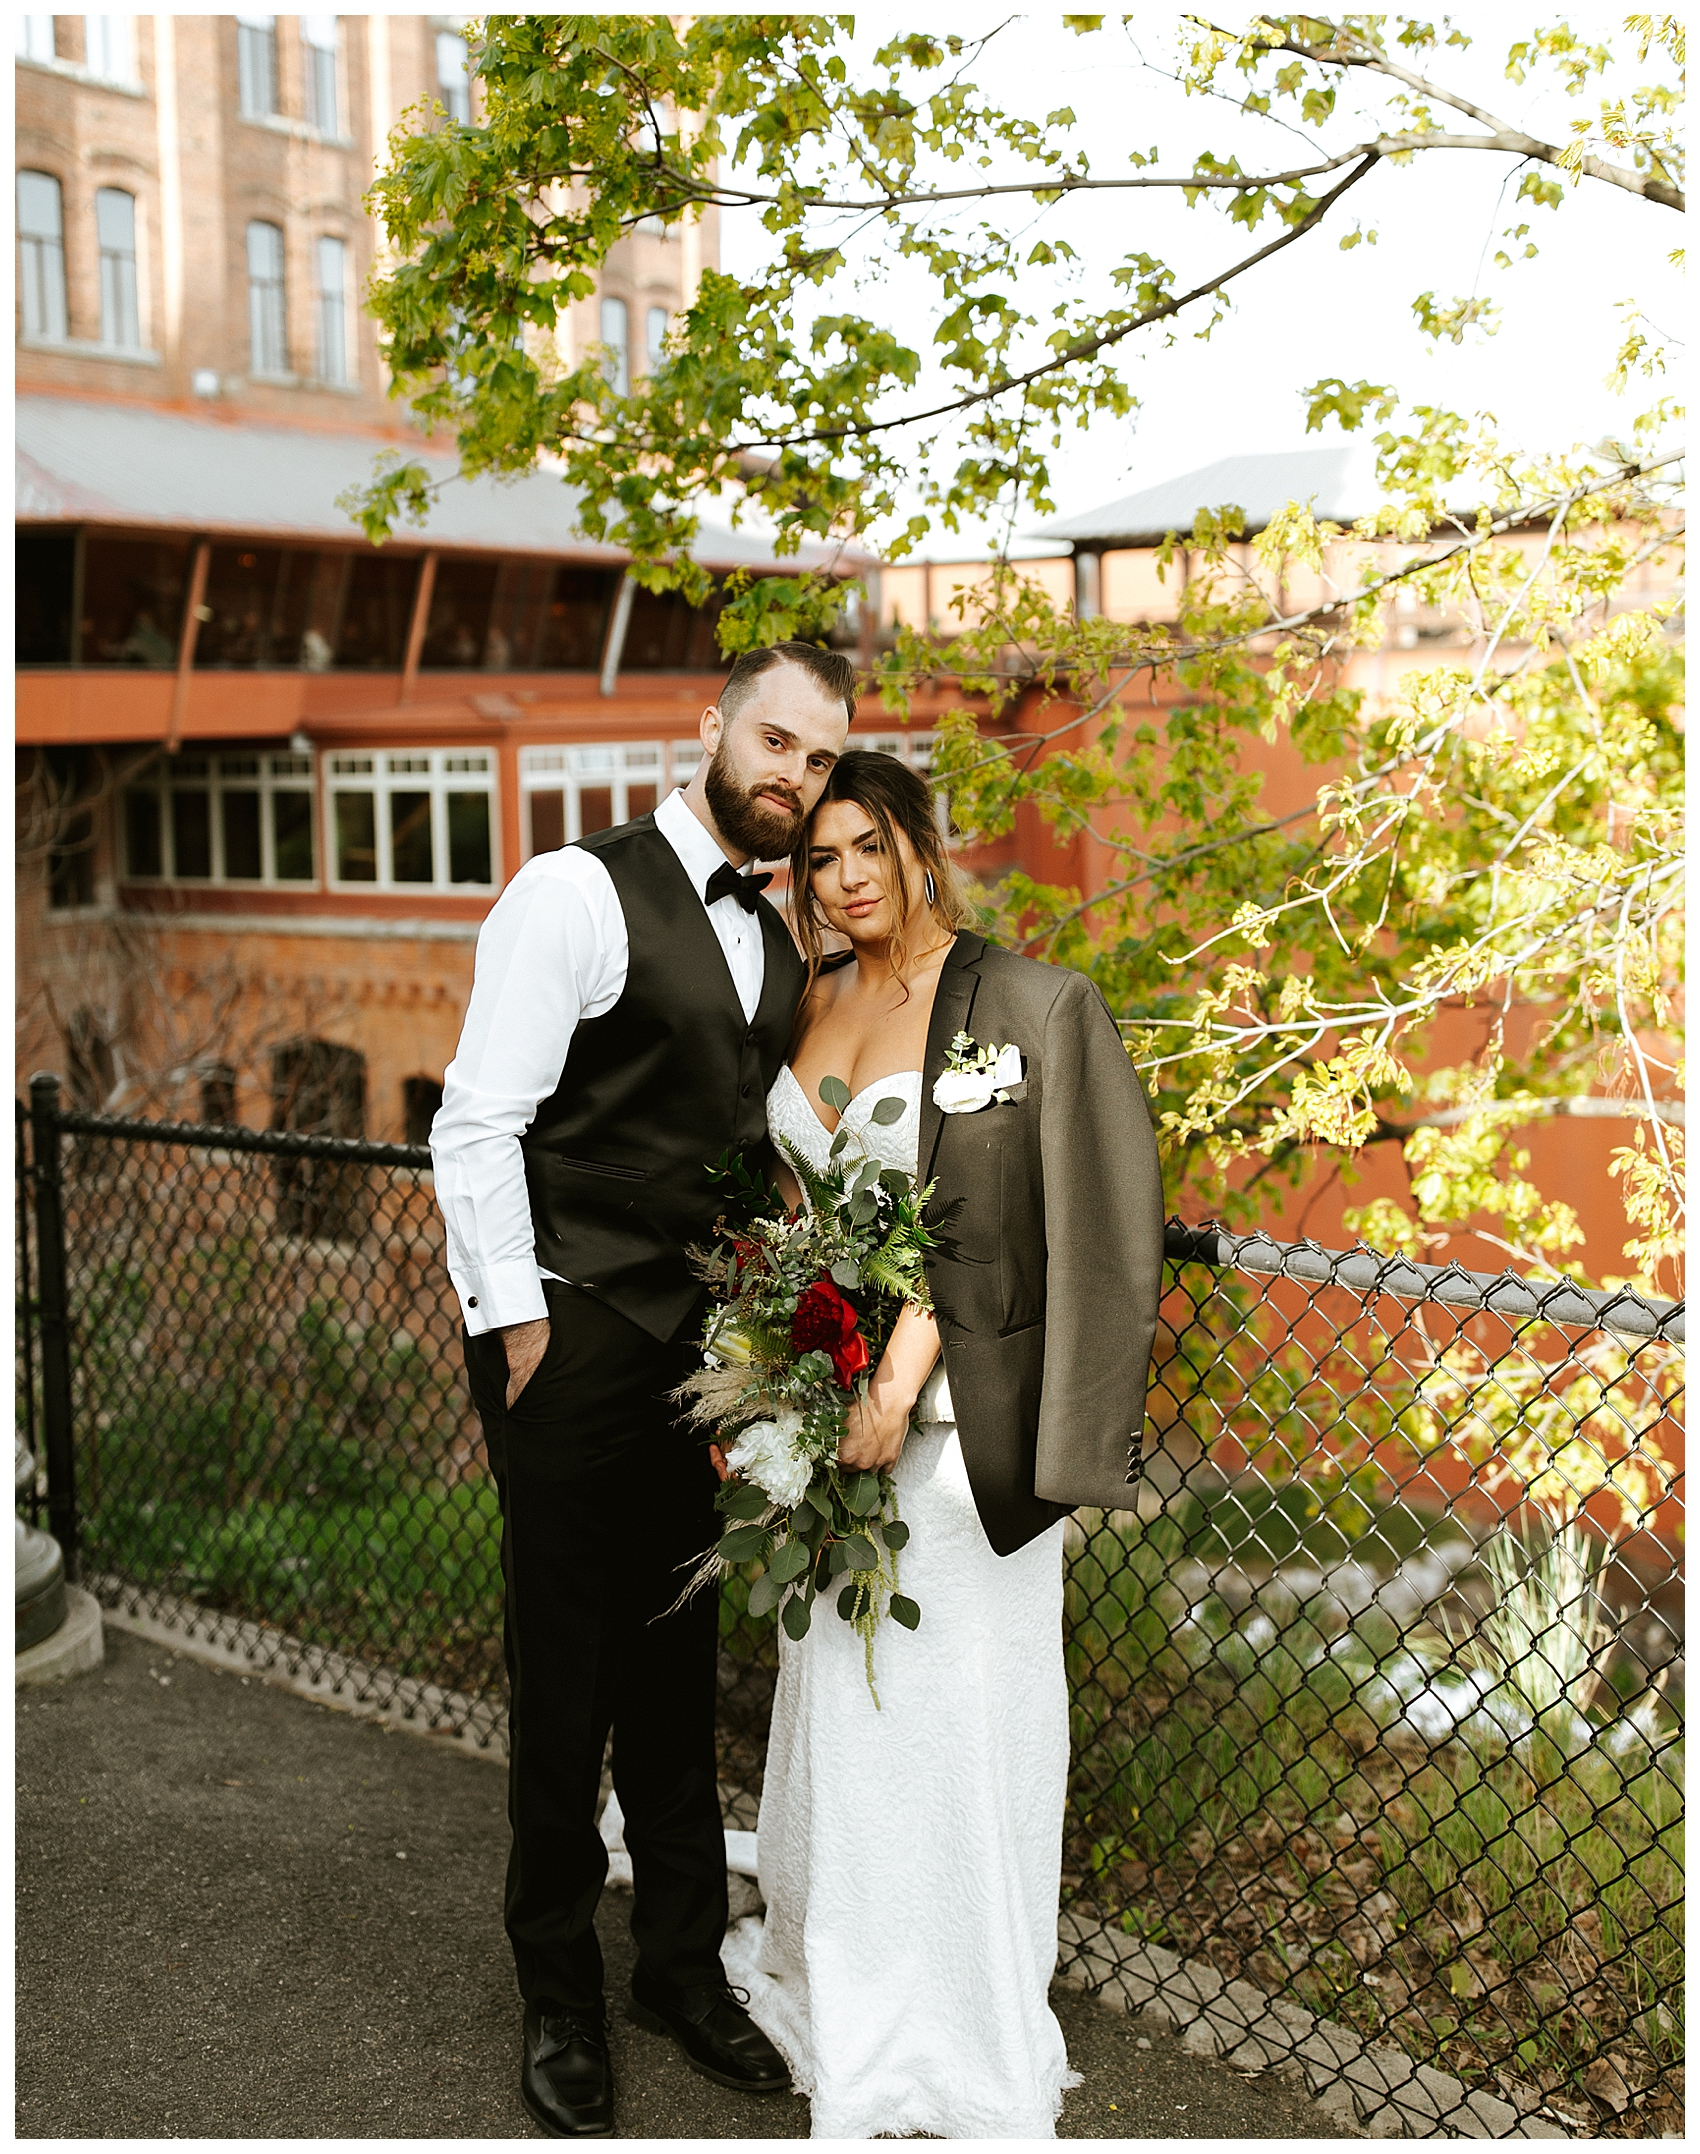 Chateau Rive Spokane Wedding Cassie Trottier Photography01085.jpg